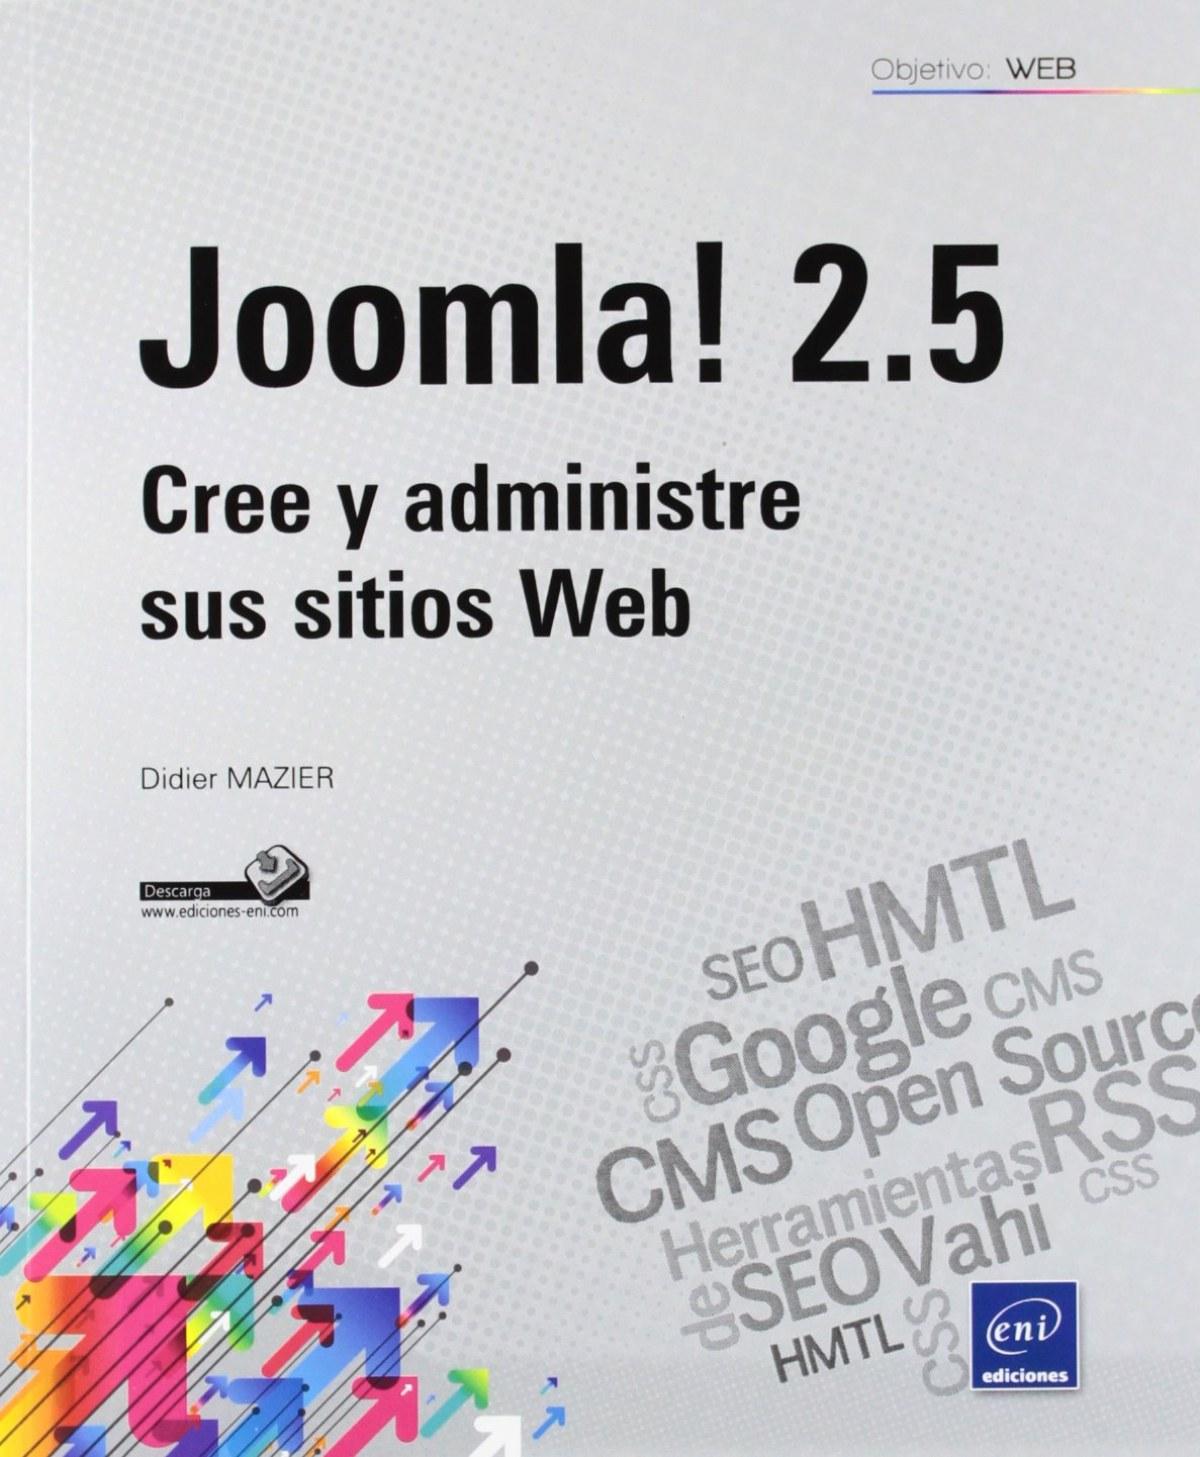 Objetivo: Web Joomla! 2.5